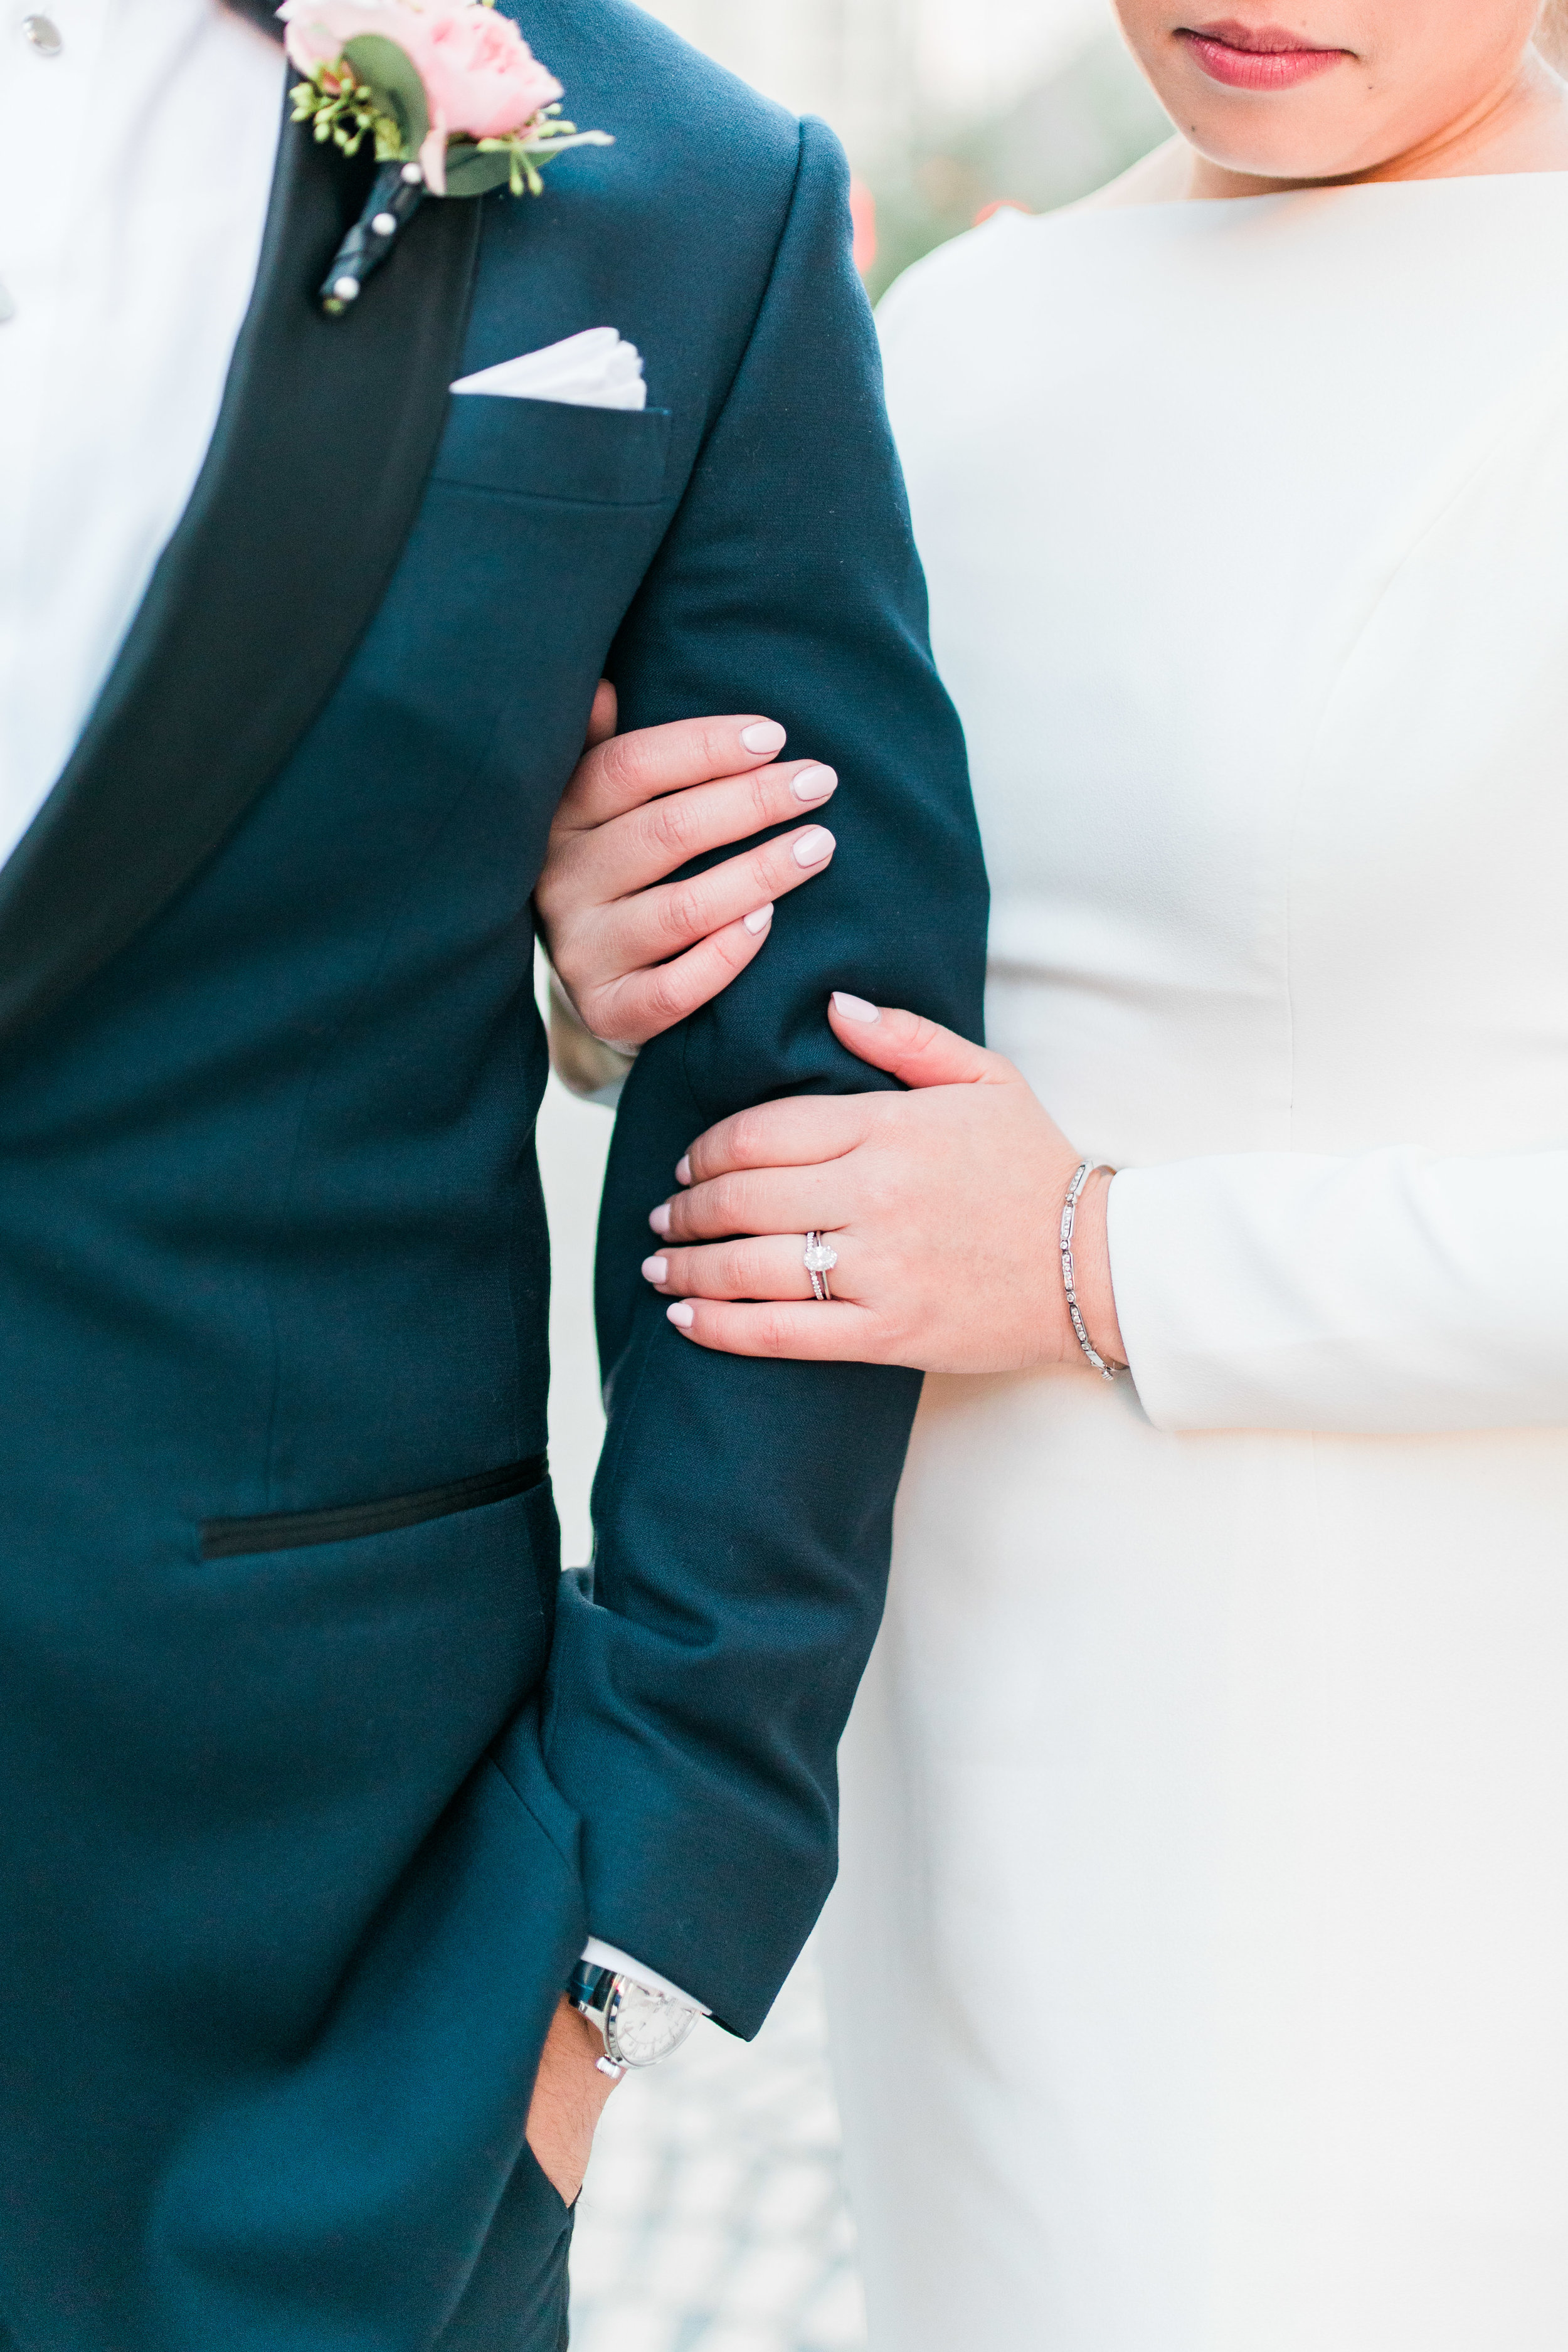 Marina-Eugene-Wedding-by-JBJ-Pictures-282.jpg